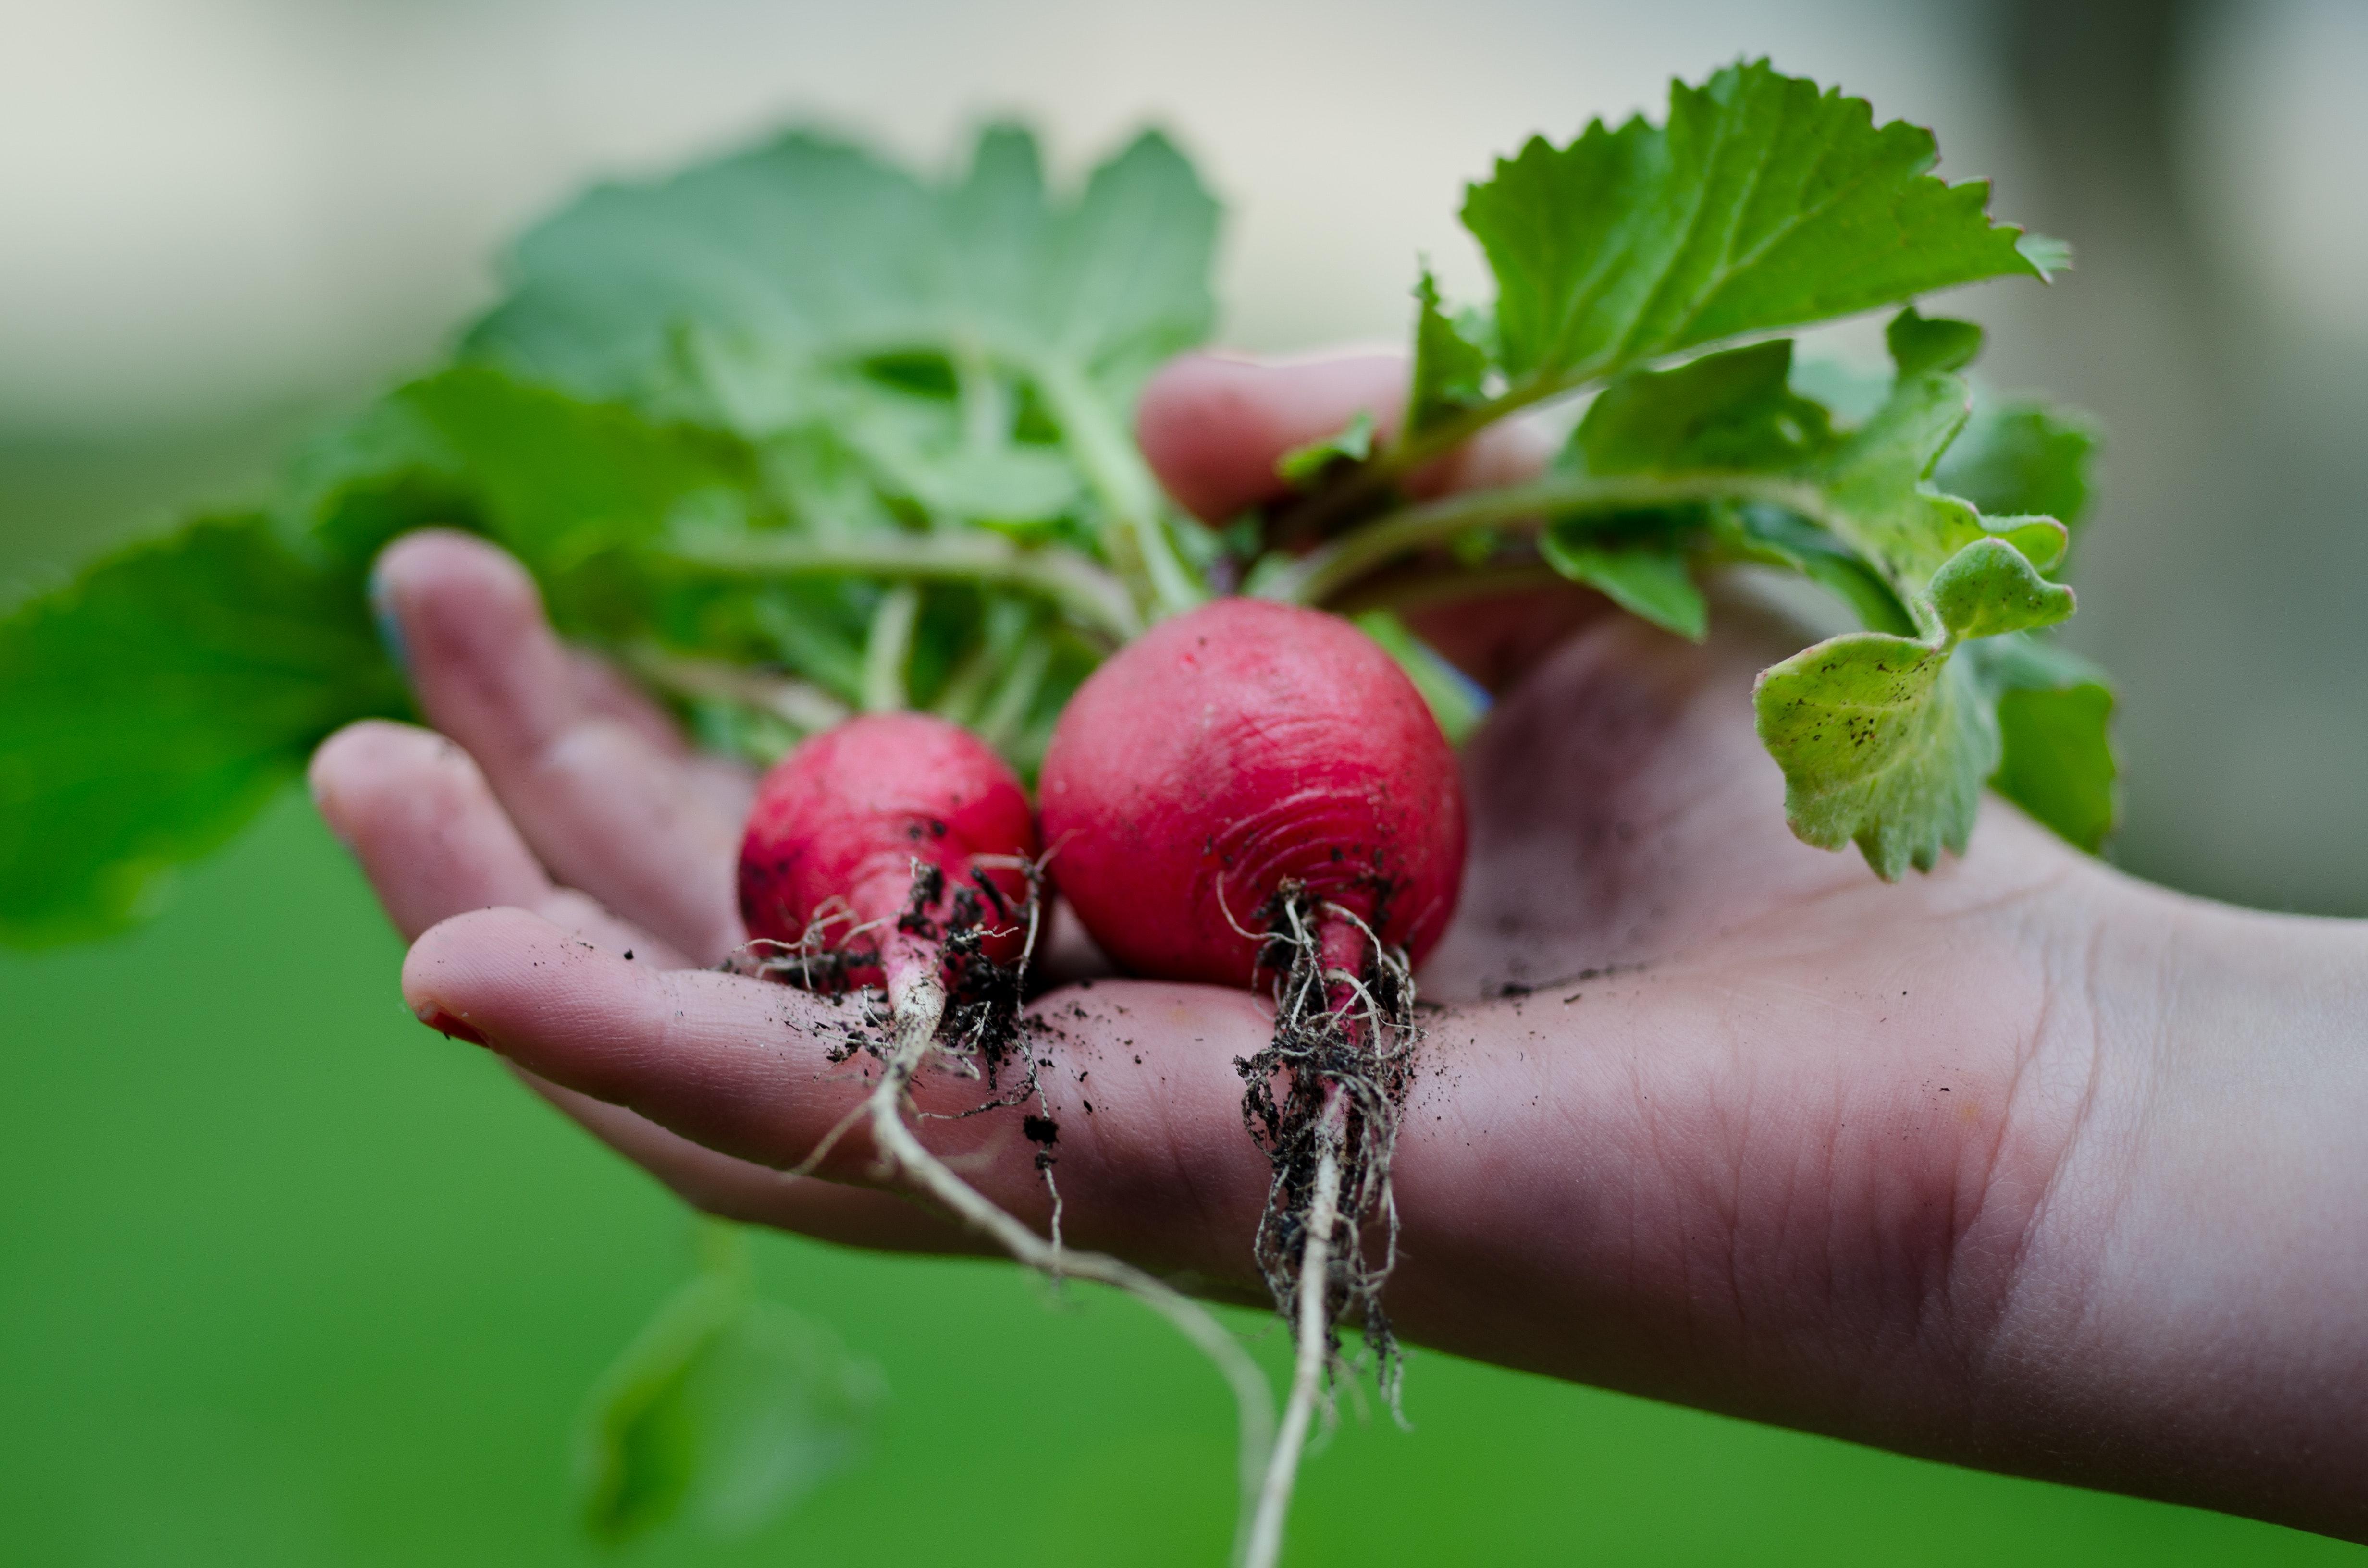 healthy-vegetables-hand-gardening-9301.jpg